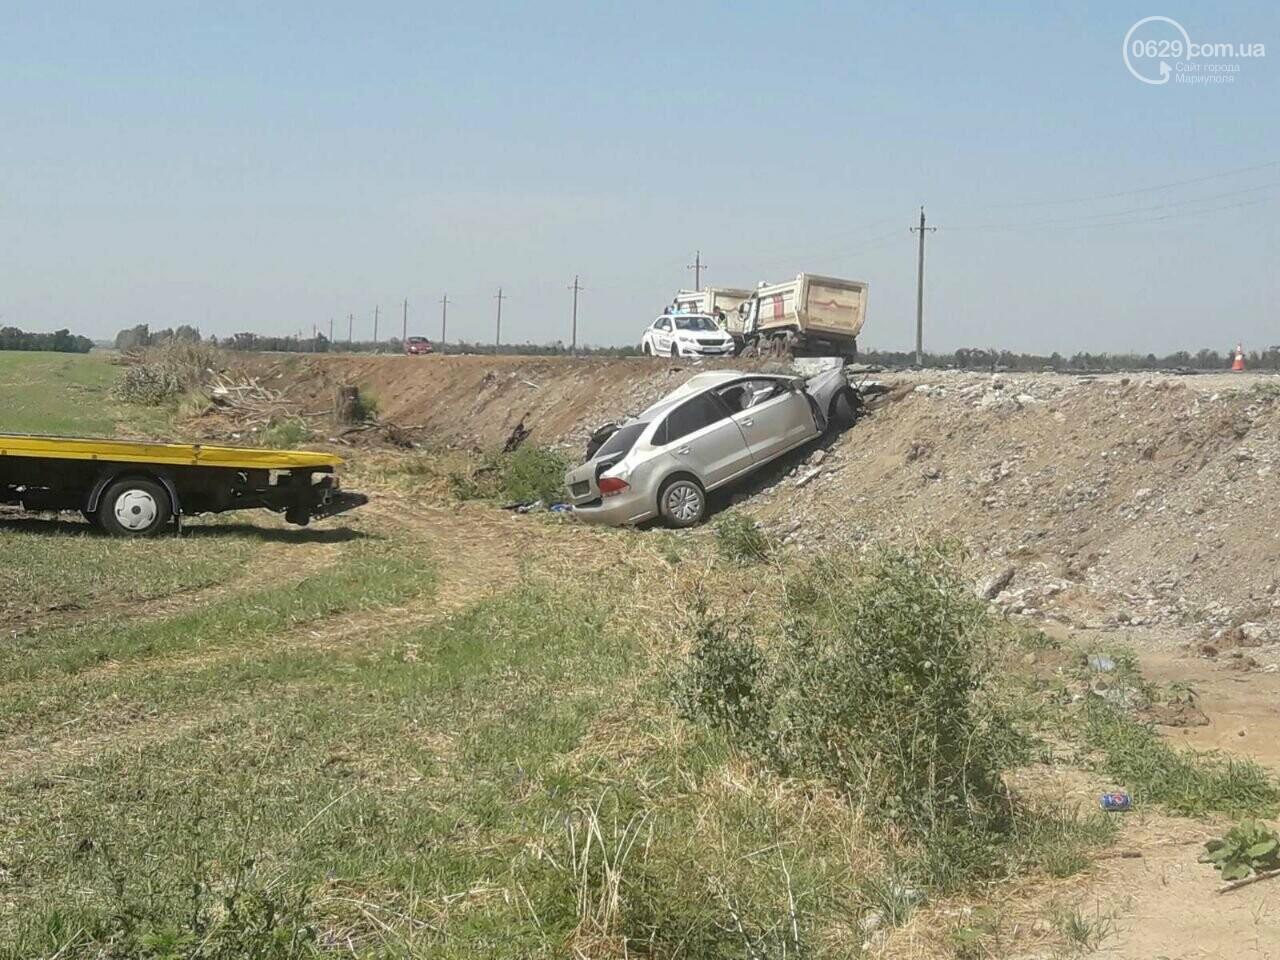 Смертельное ДТП. Под Мариуполем  грузовик протаранил легковушку, - ФОТО, фото-1